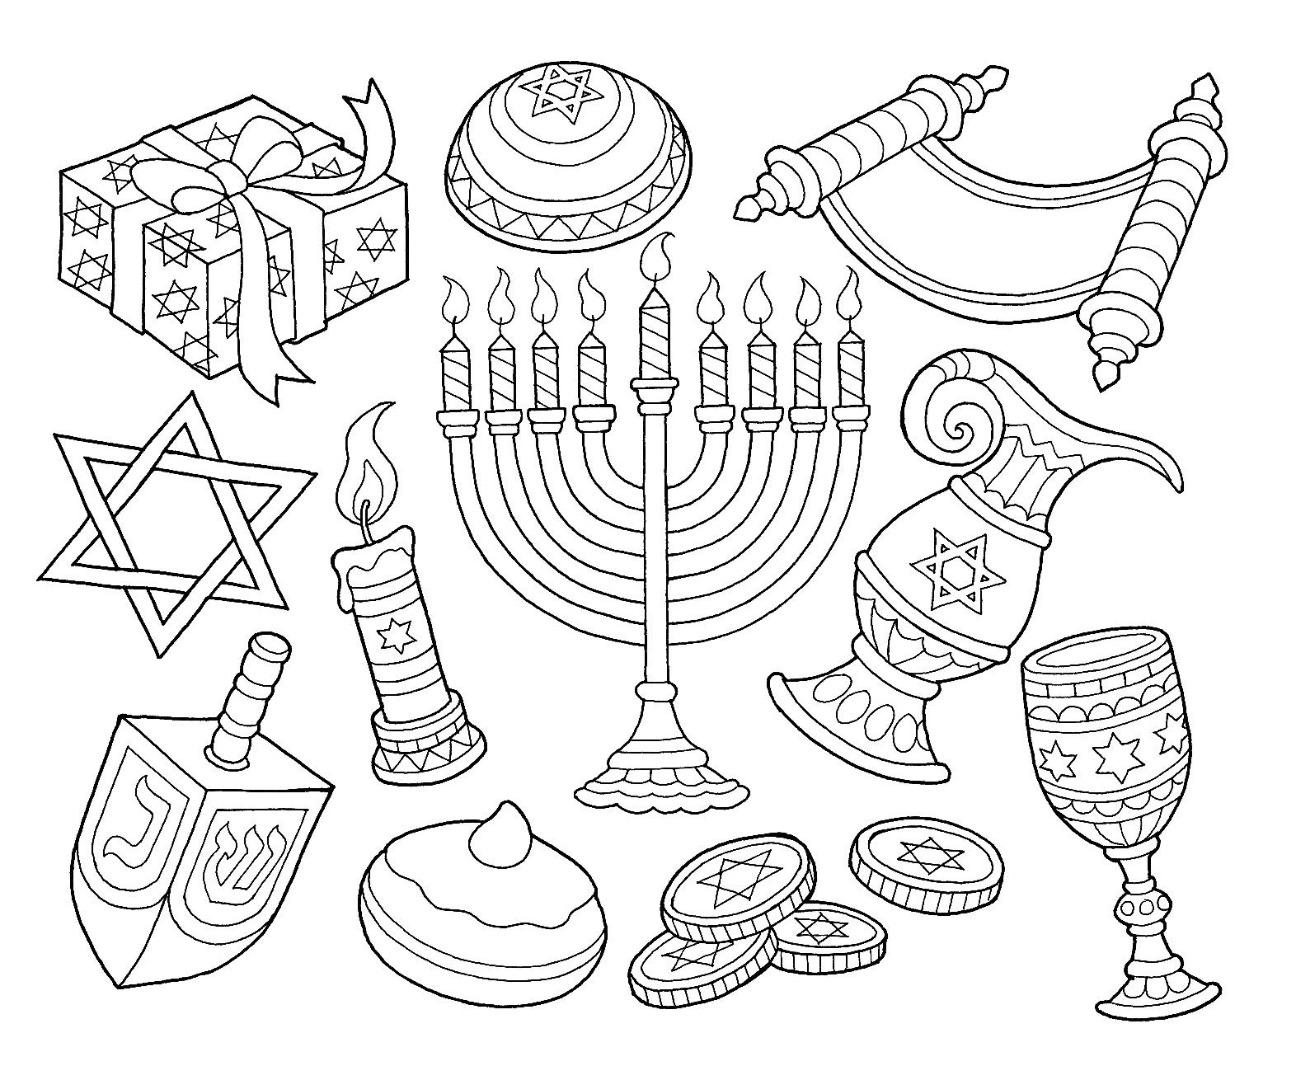 8 Free Hanukkah Coloring Pages / Drawings